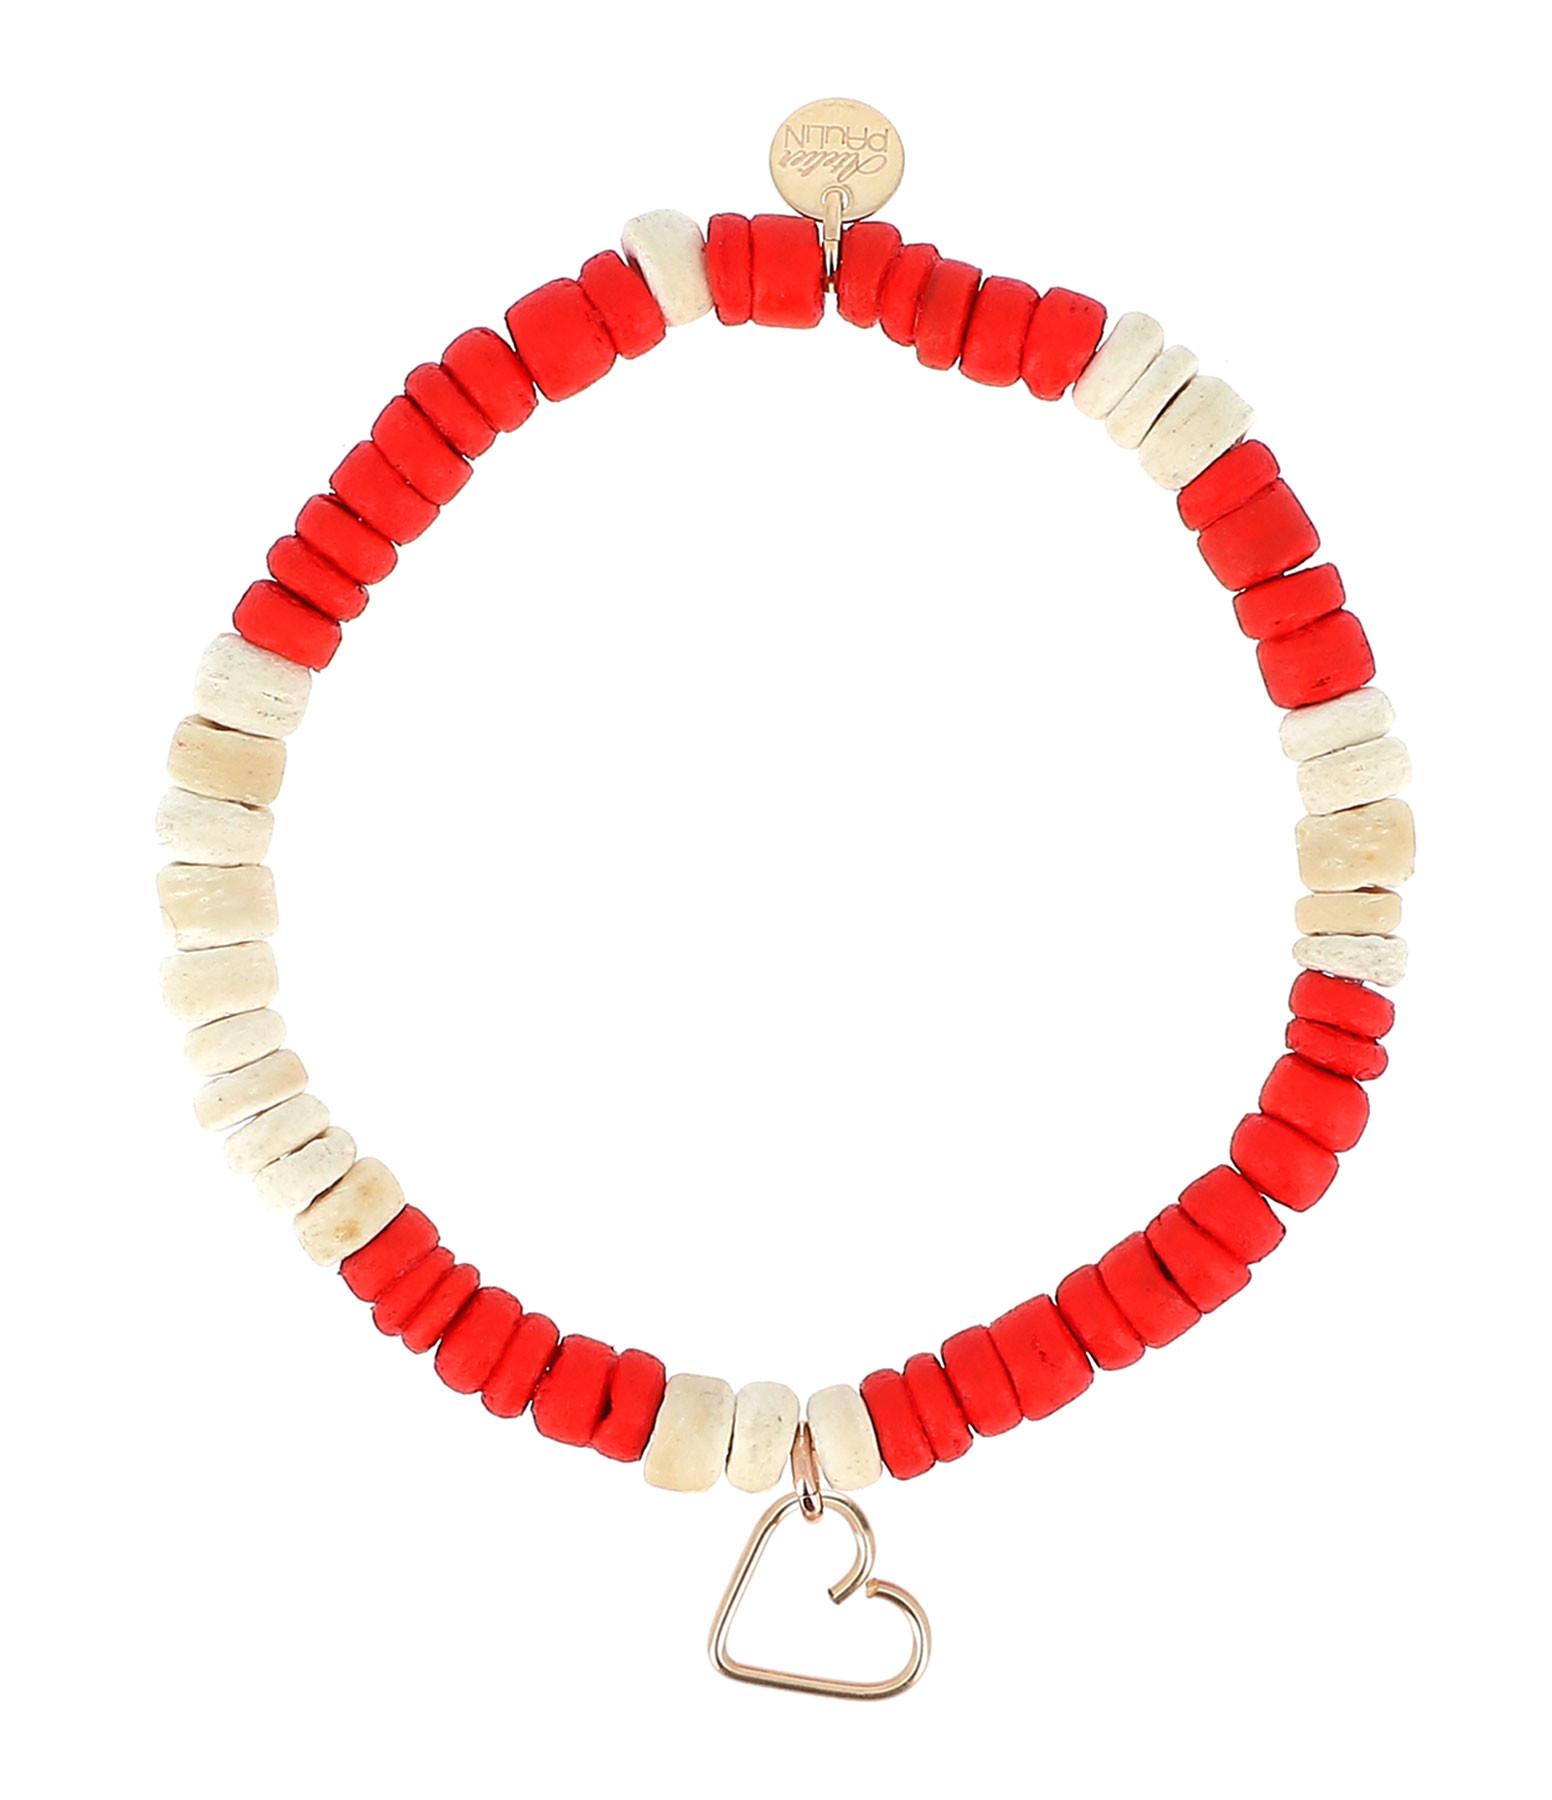 ATELIER PAULIN - Bracelet Talisman Coeur Rouge Écru Gold Filled